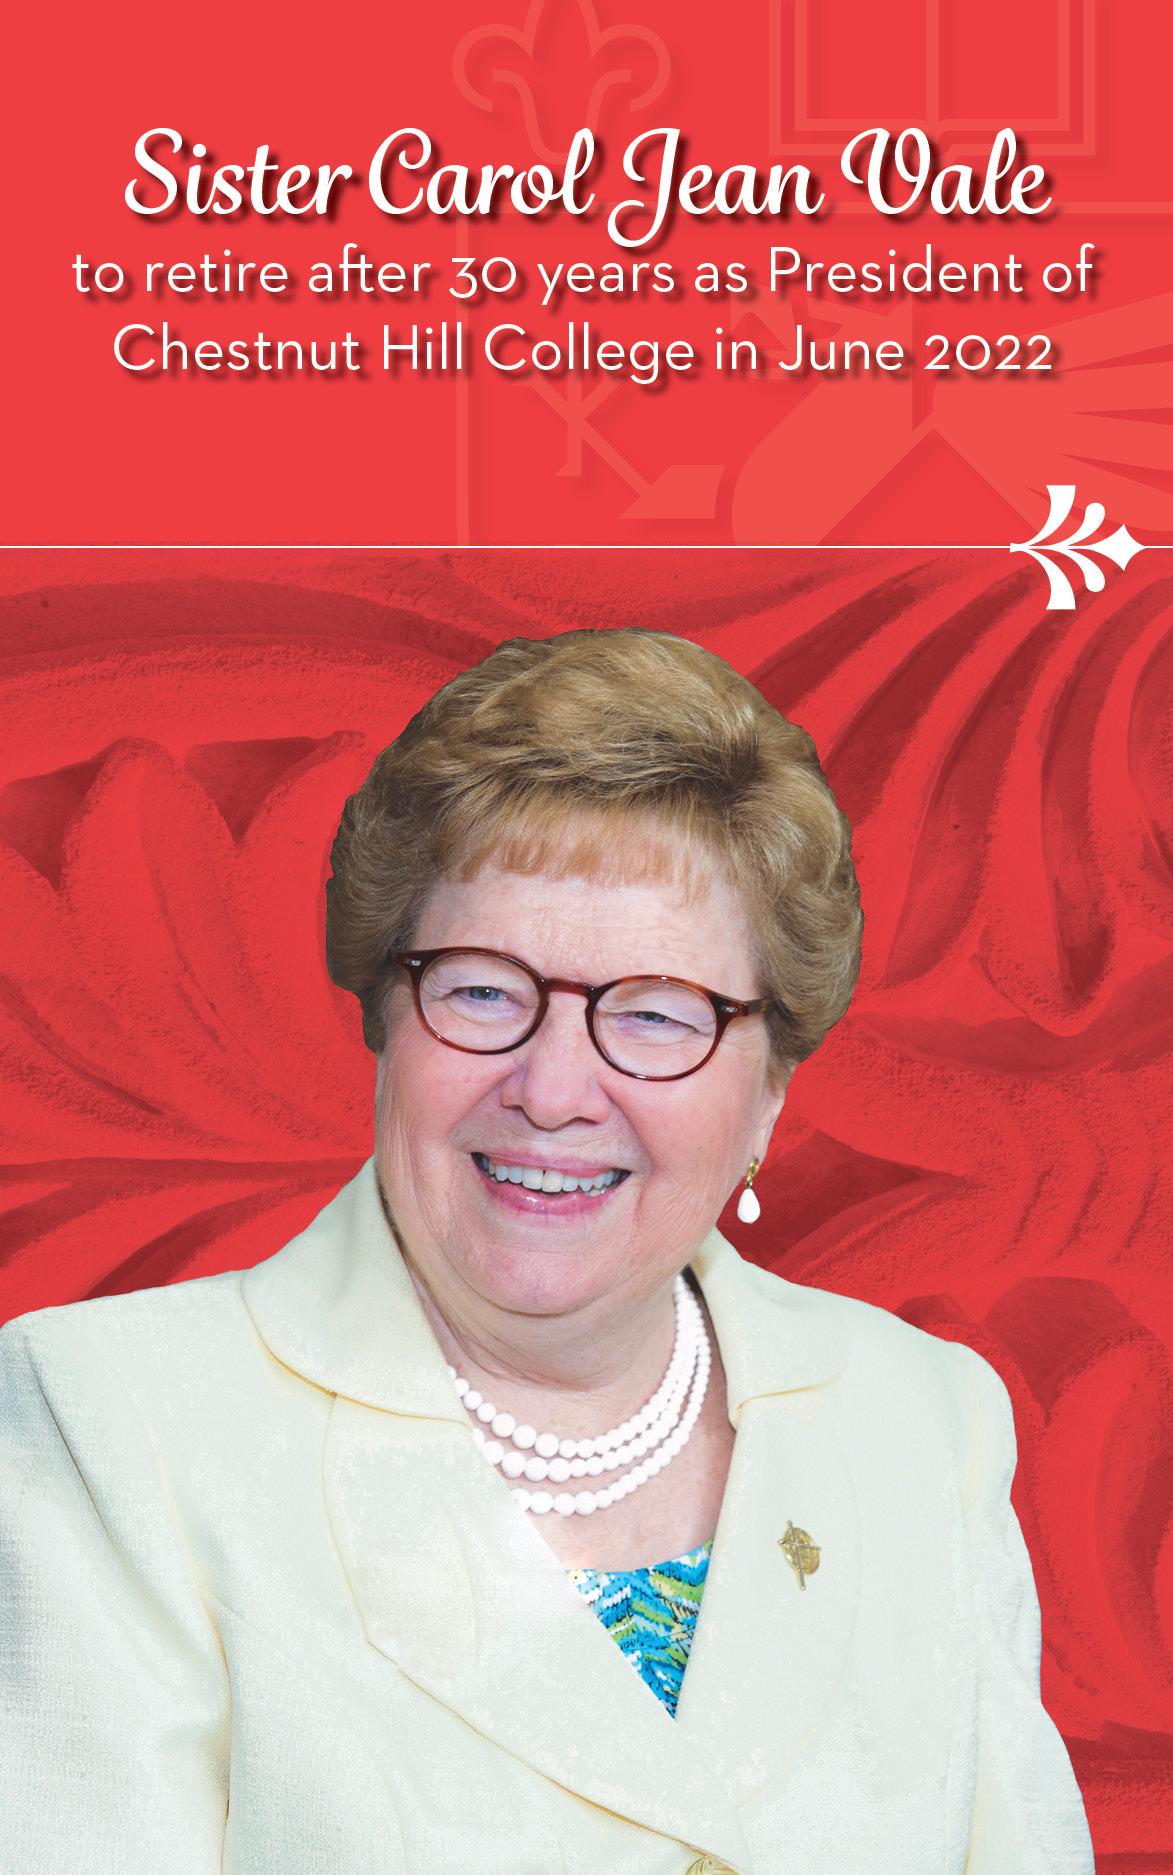 Sister carol retirement message